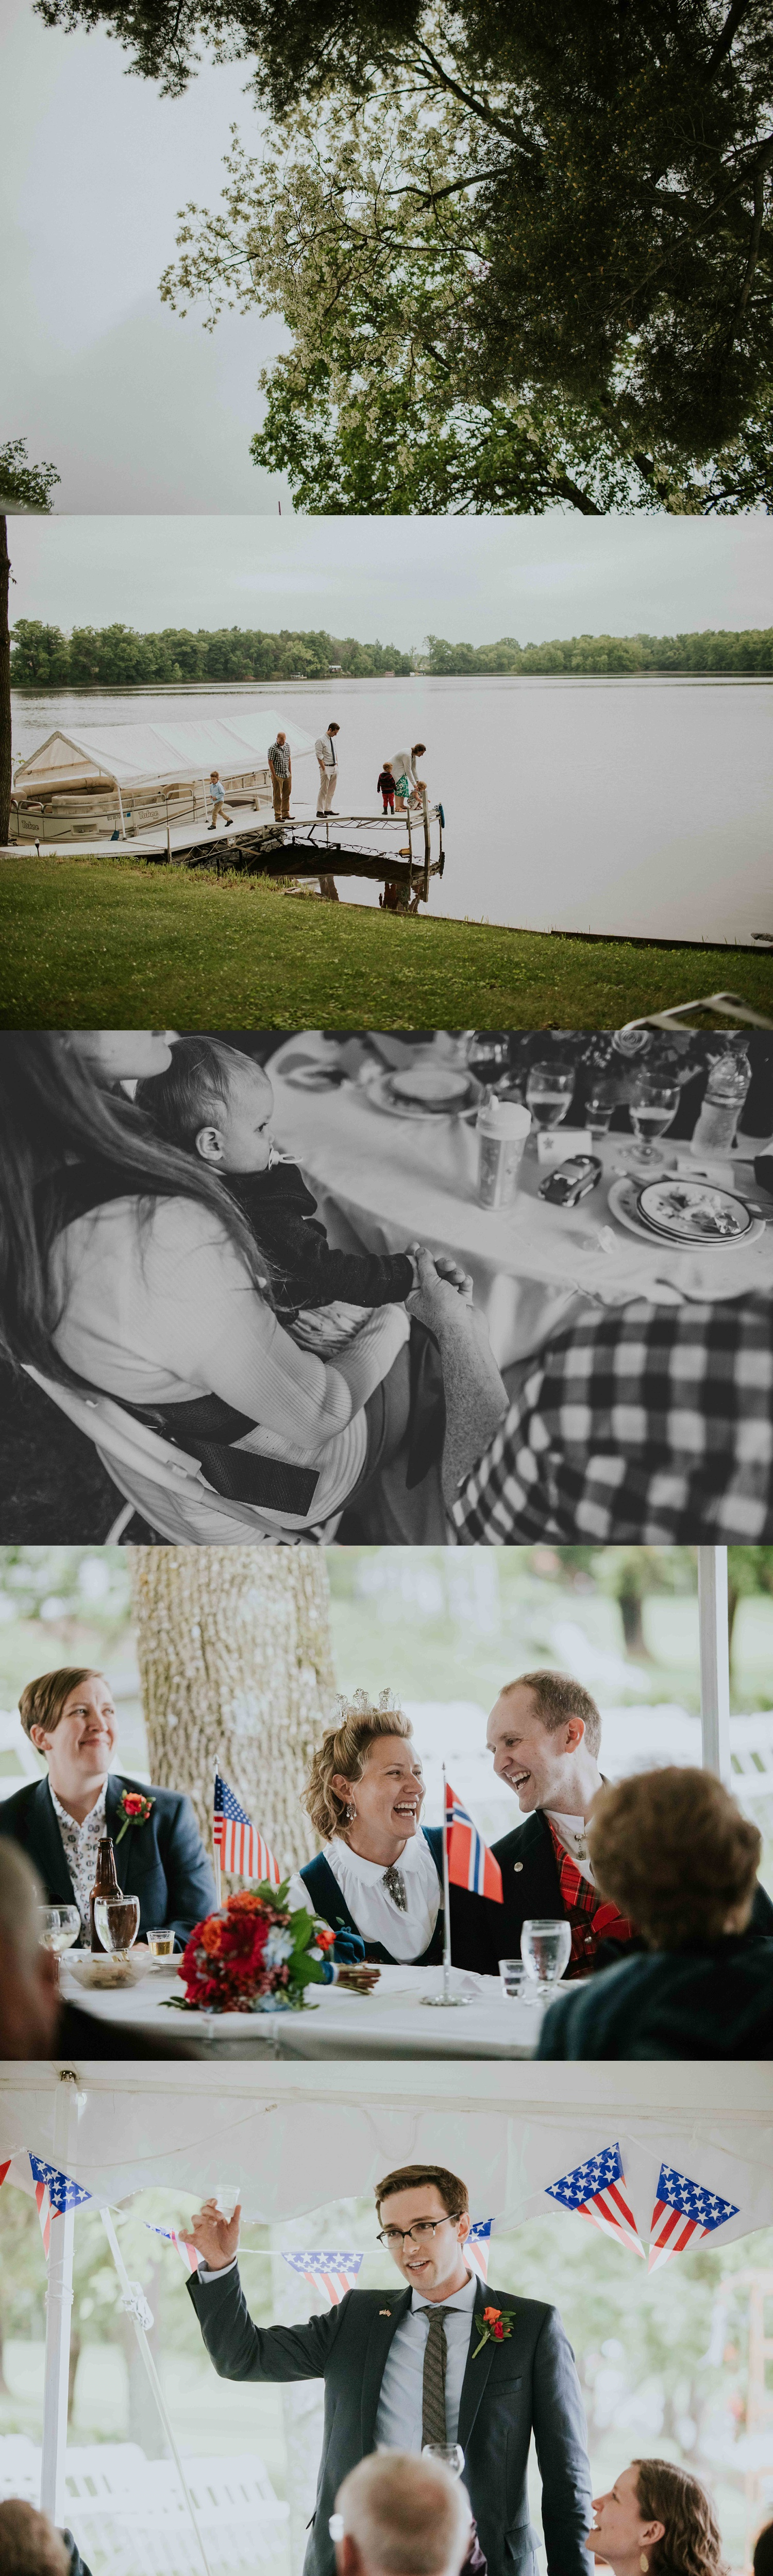 Norwegian Wedding Stevens Point Wisconsin Wedding Photographer Chloe Ann Photography_0028.jpg